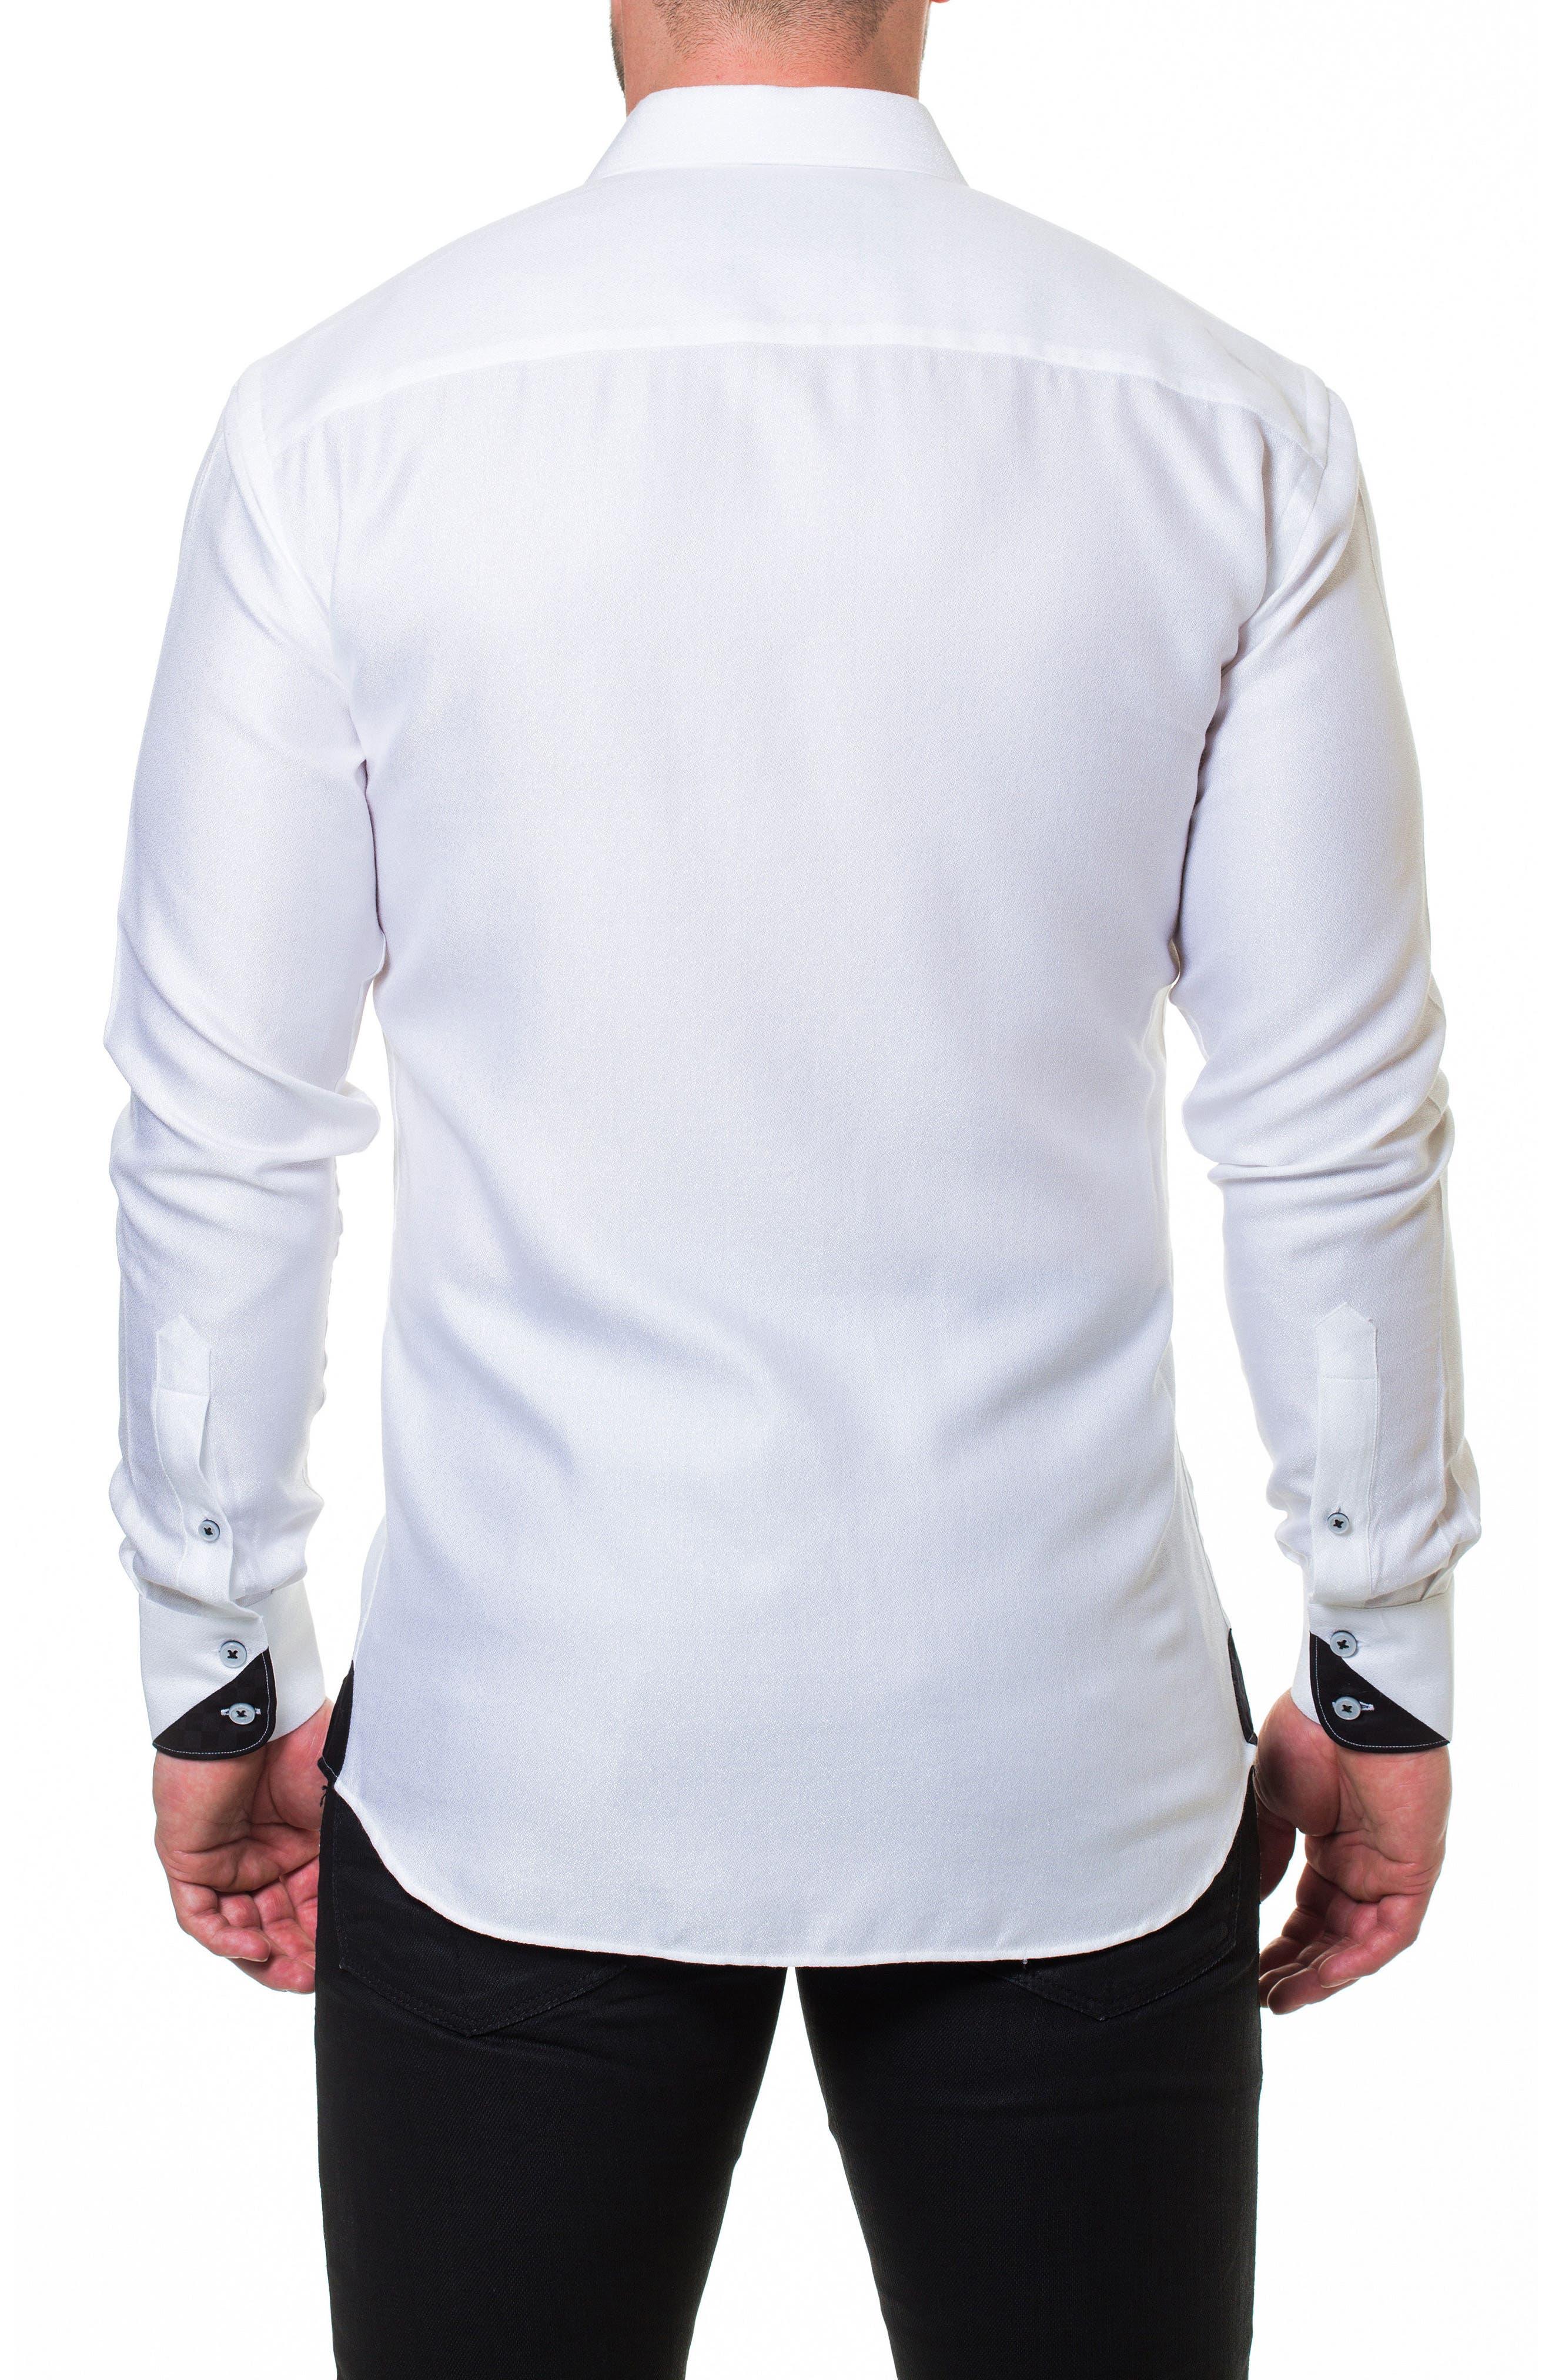 Wall Street Serenity White Slim Fit Sport Shirt,                             Alternate thumbnail 2, color,                             110